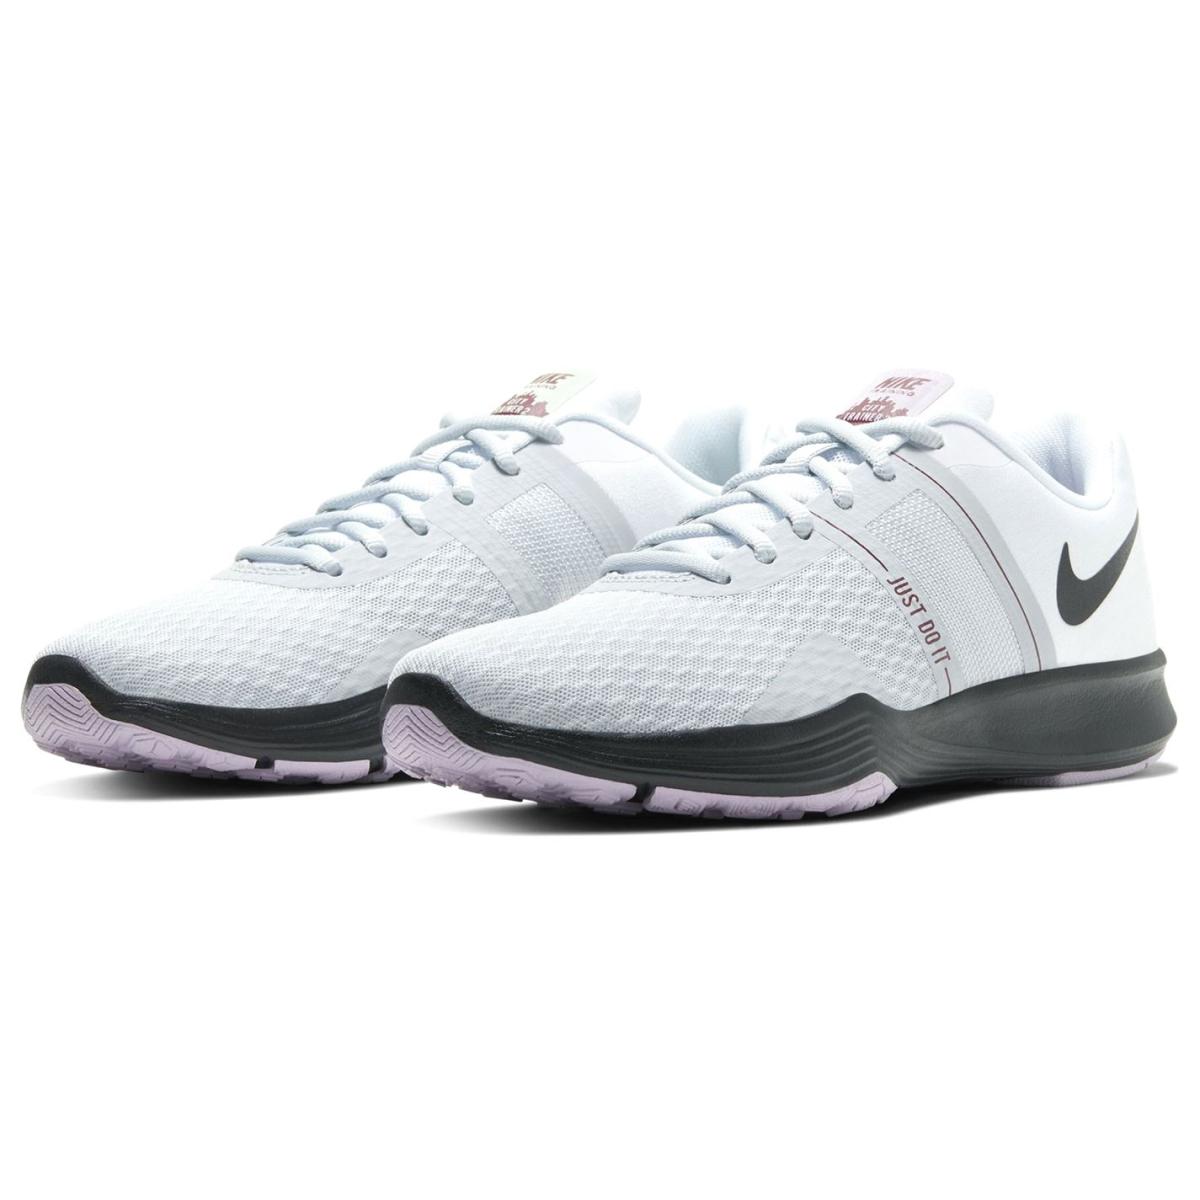 Nike-City-Trainer-2-Turnschuhe-Laufschuhe-Damen-Sportschuhe-Sneaker-3121 Indexbild 11